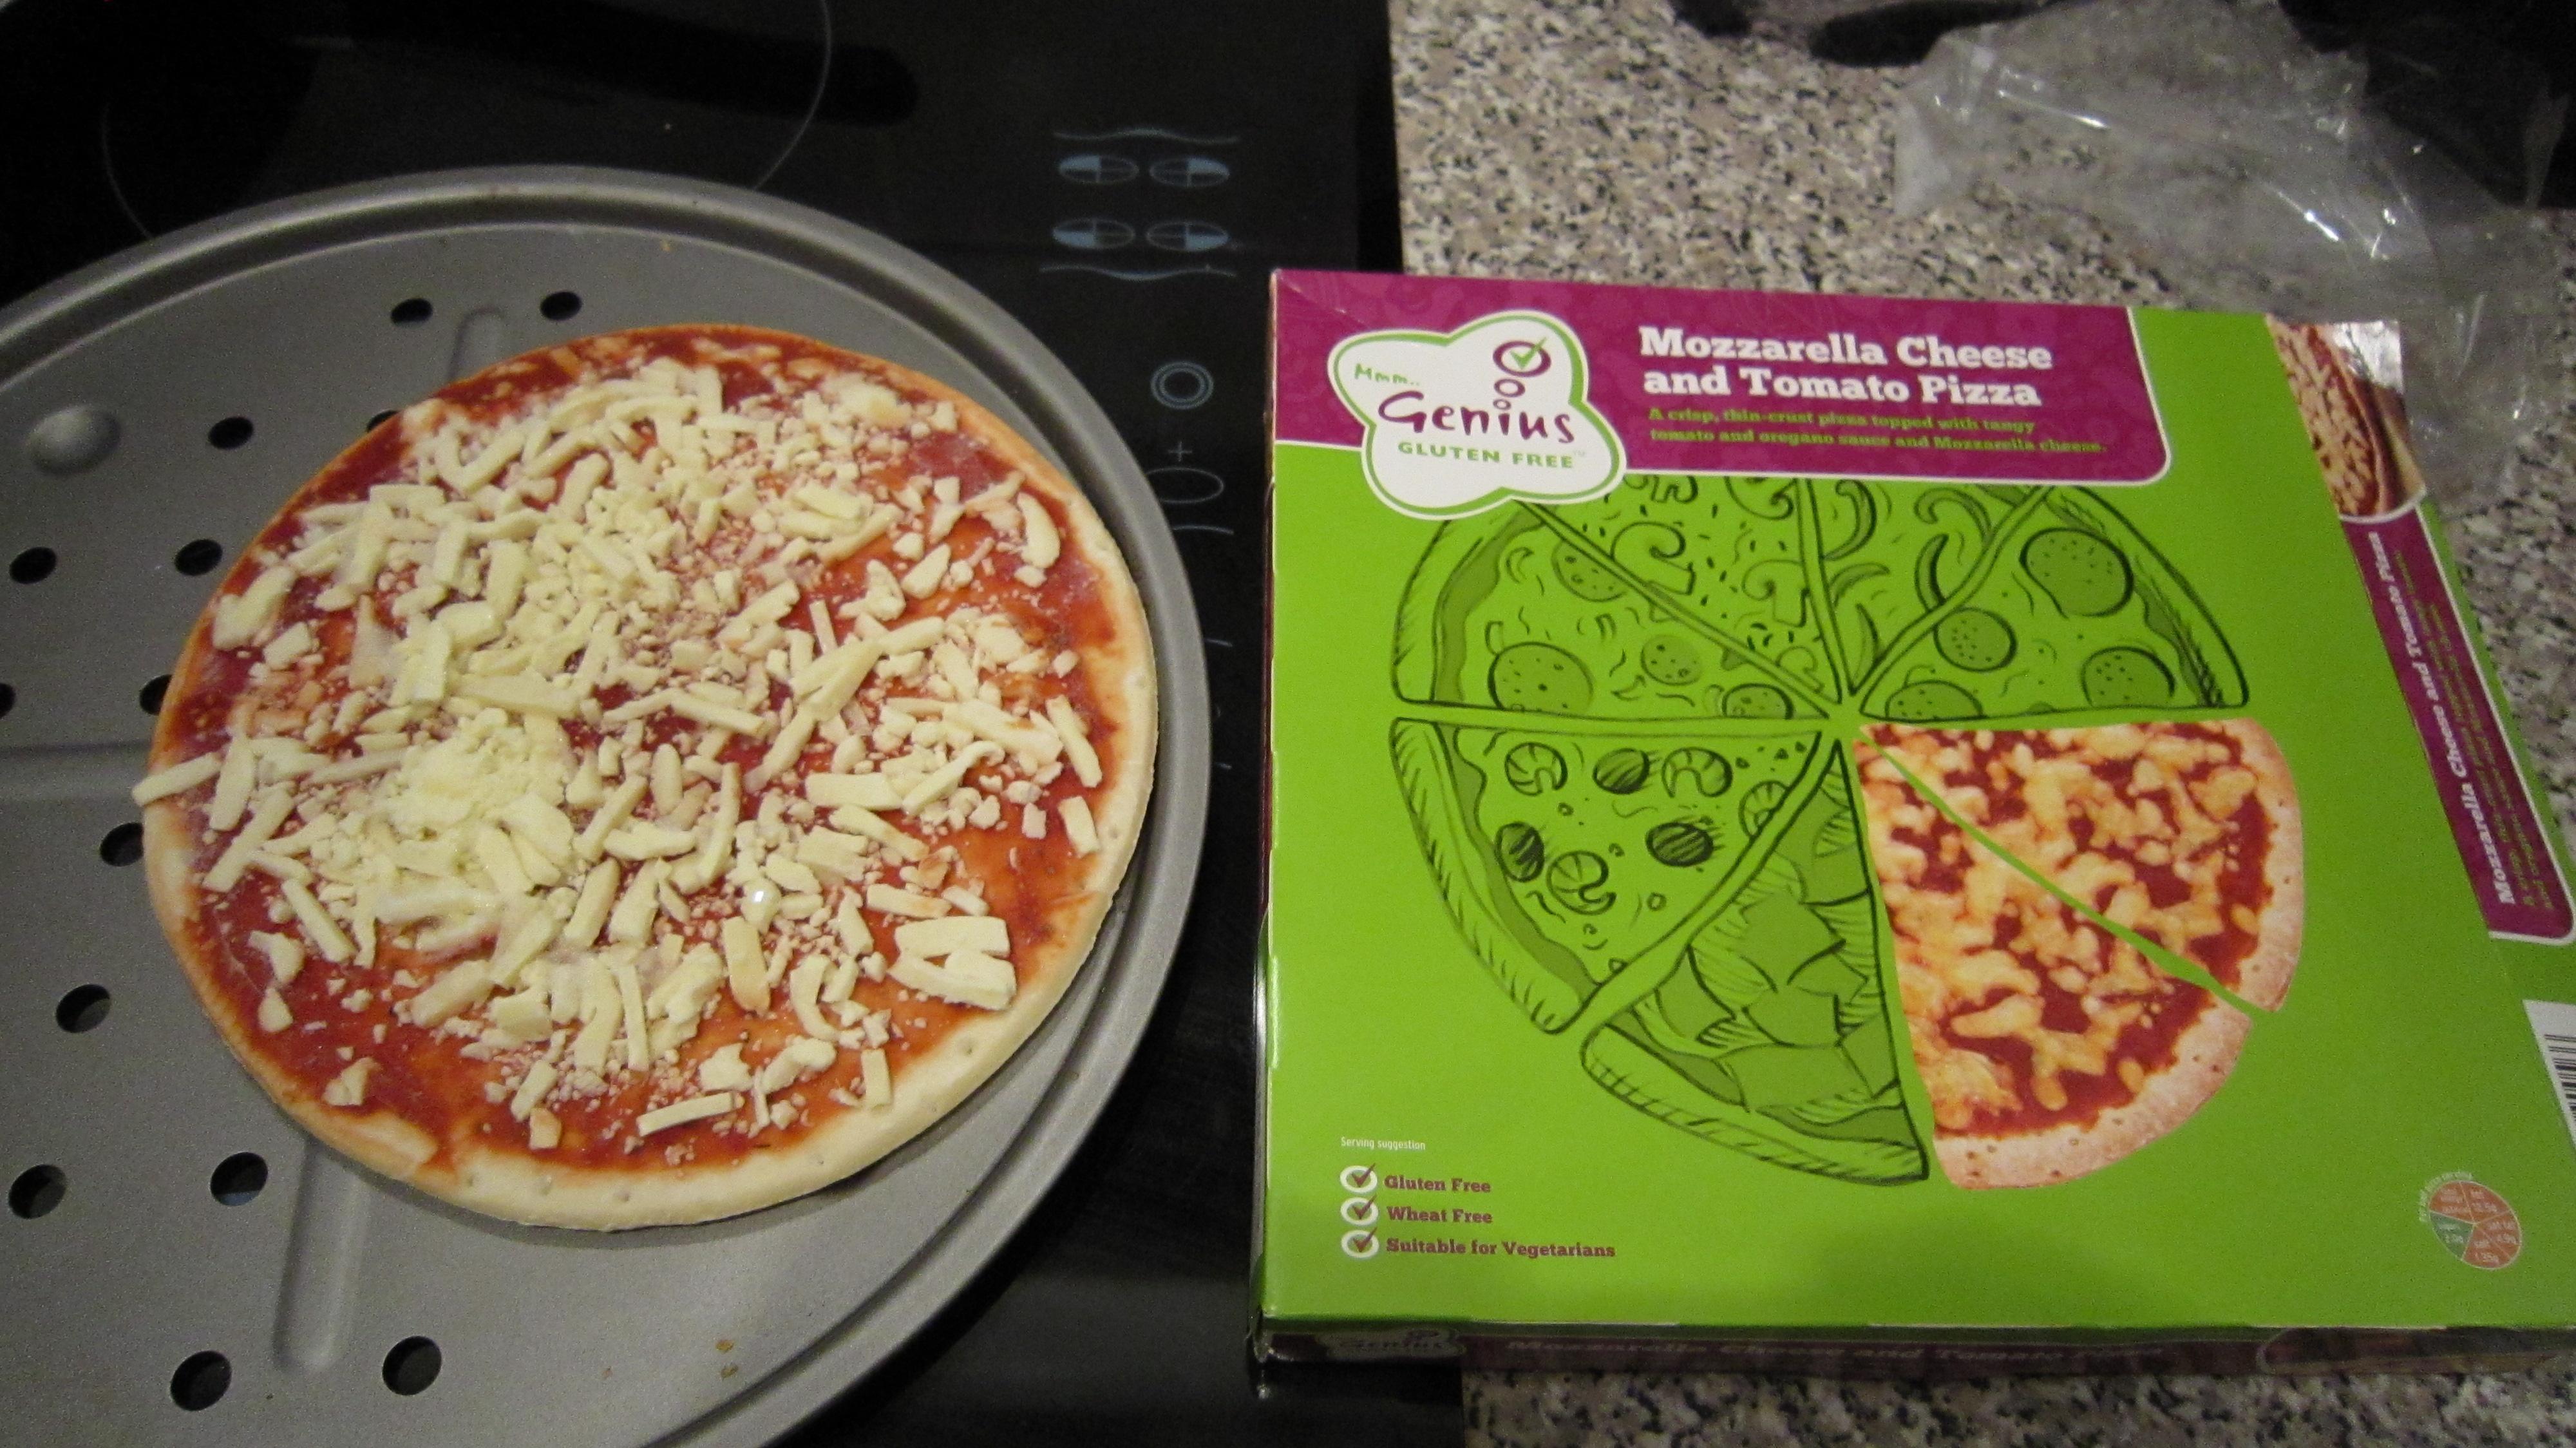 Tiny pizza sits atop a regular pizza tray